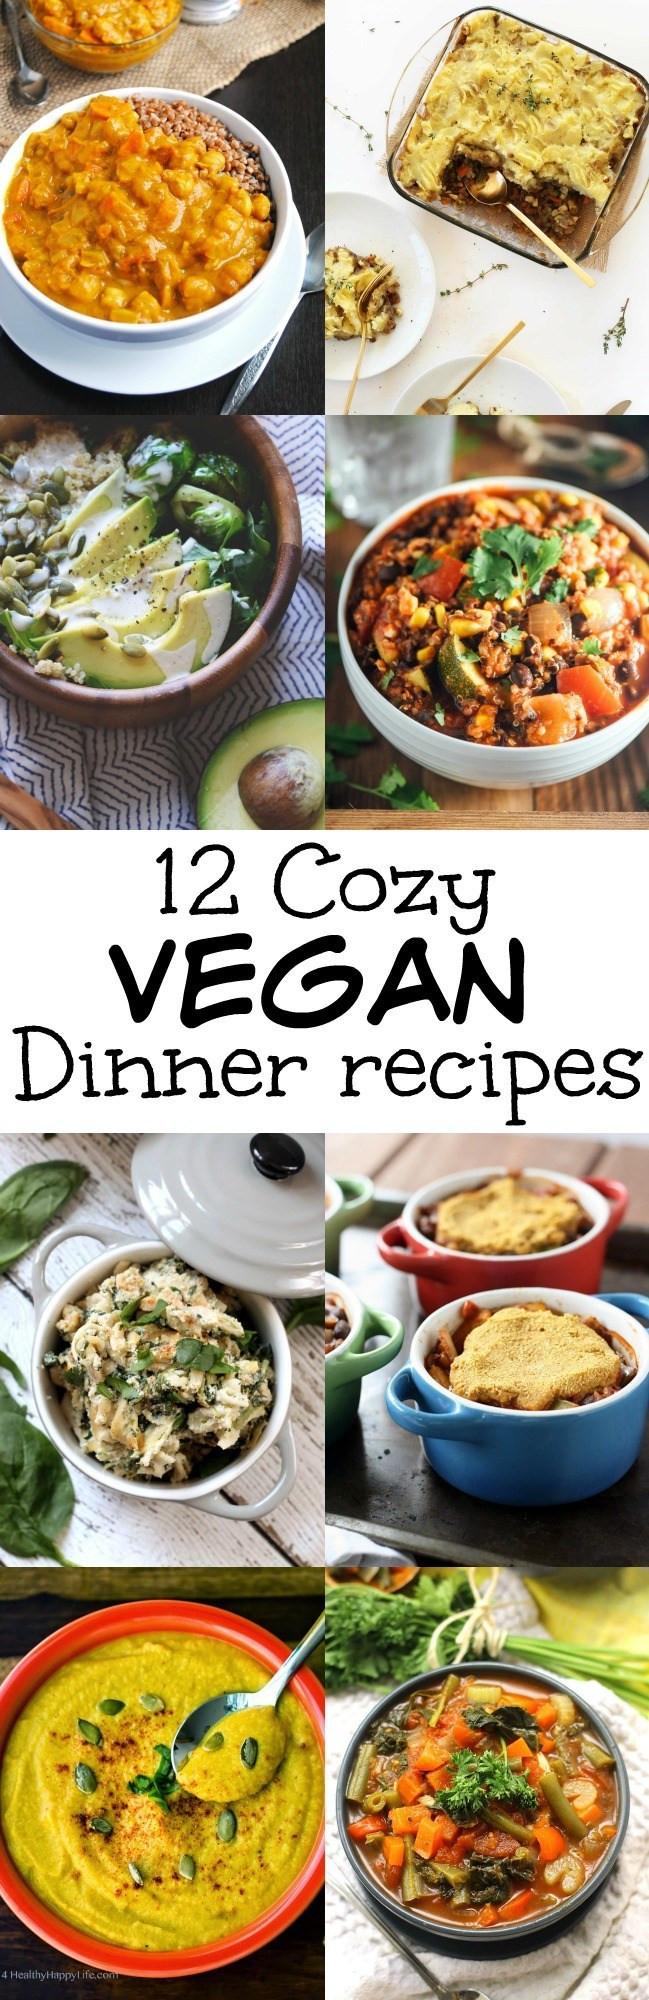 Good Vegan Dinners  12 Cozy Feel Good Vegan Dinner Recipes